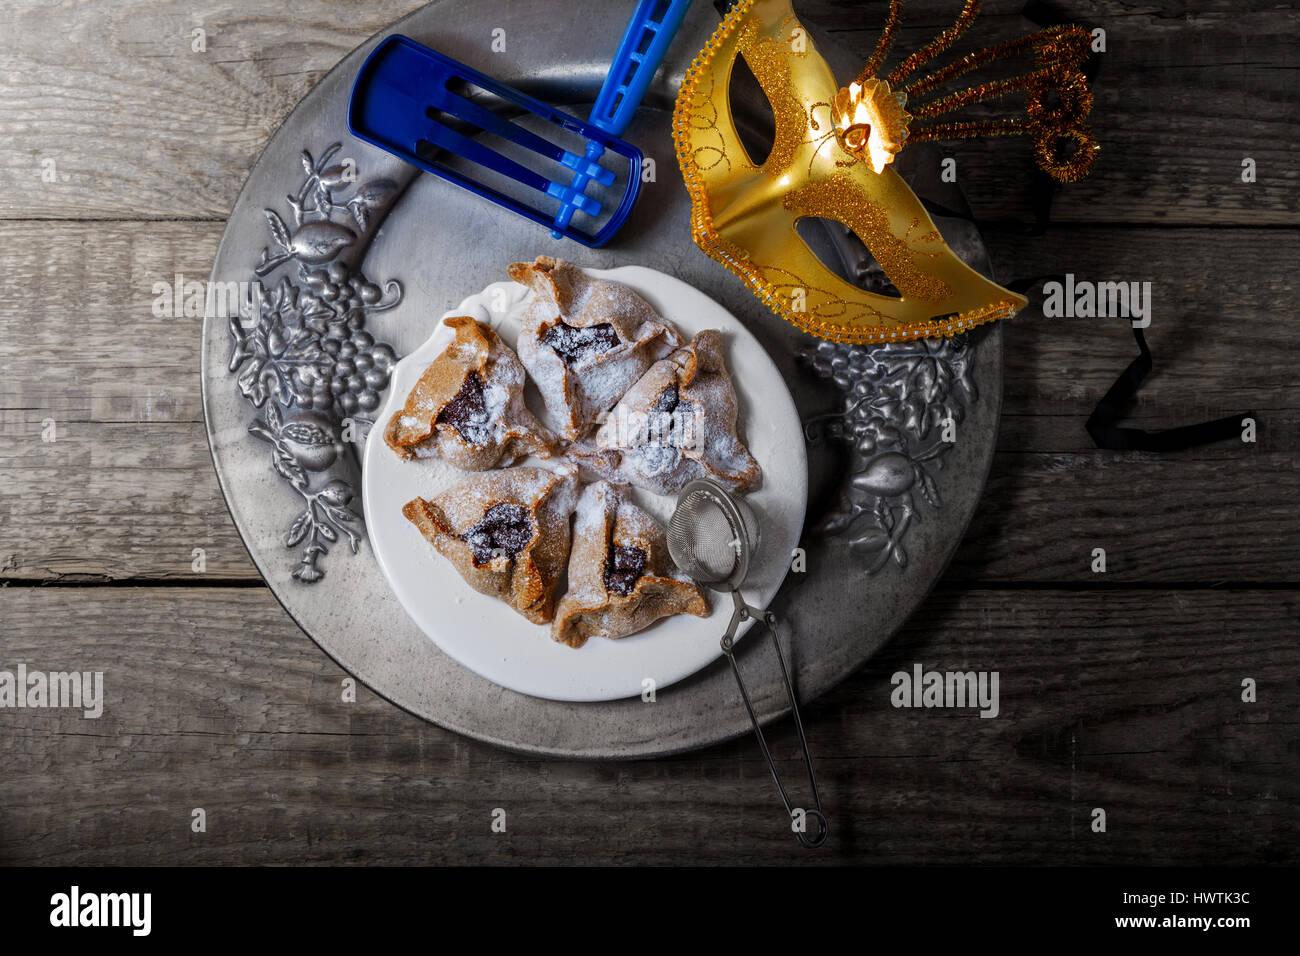 Jewish Pastry Hamantaschen - Stock Image